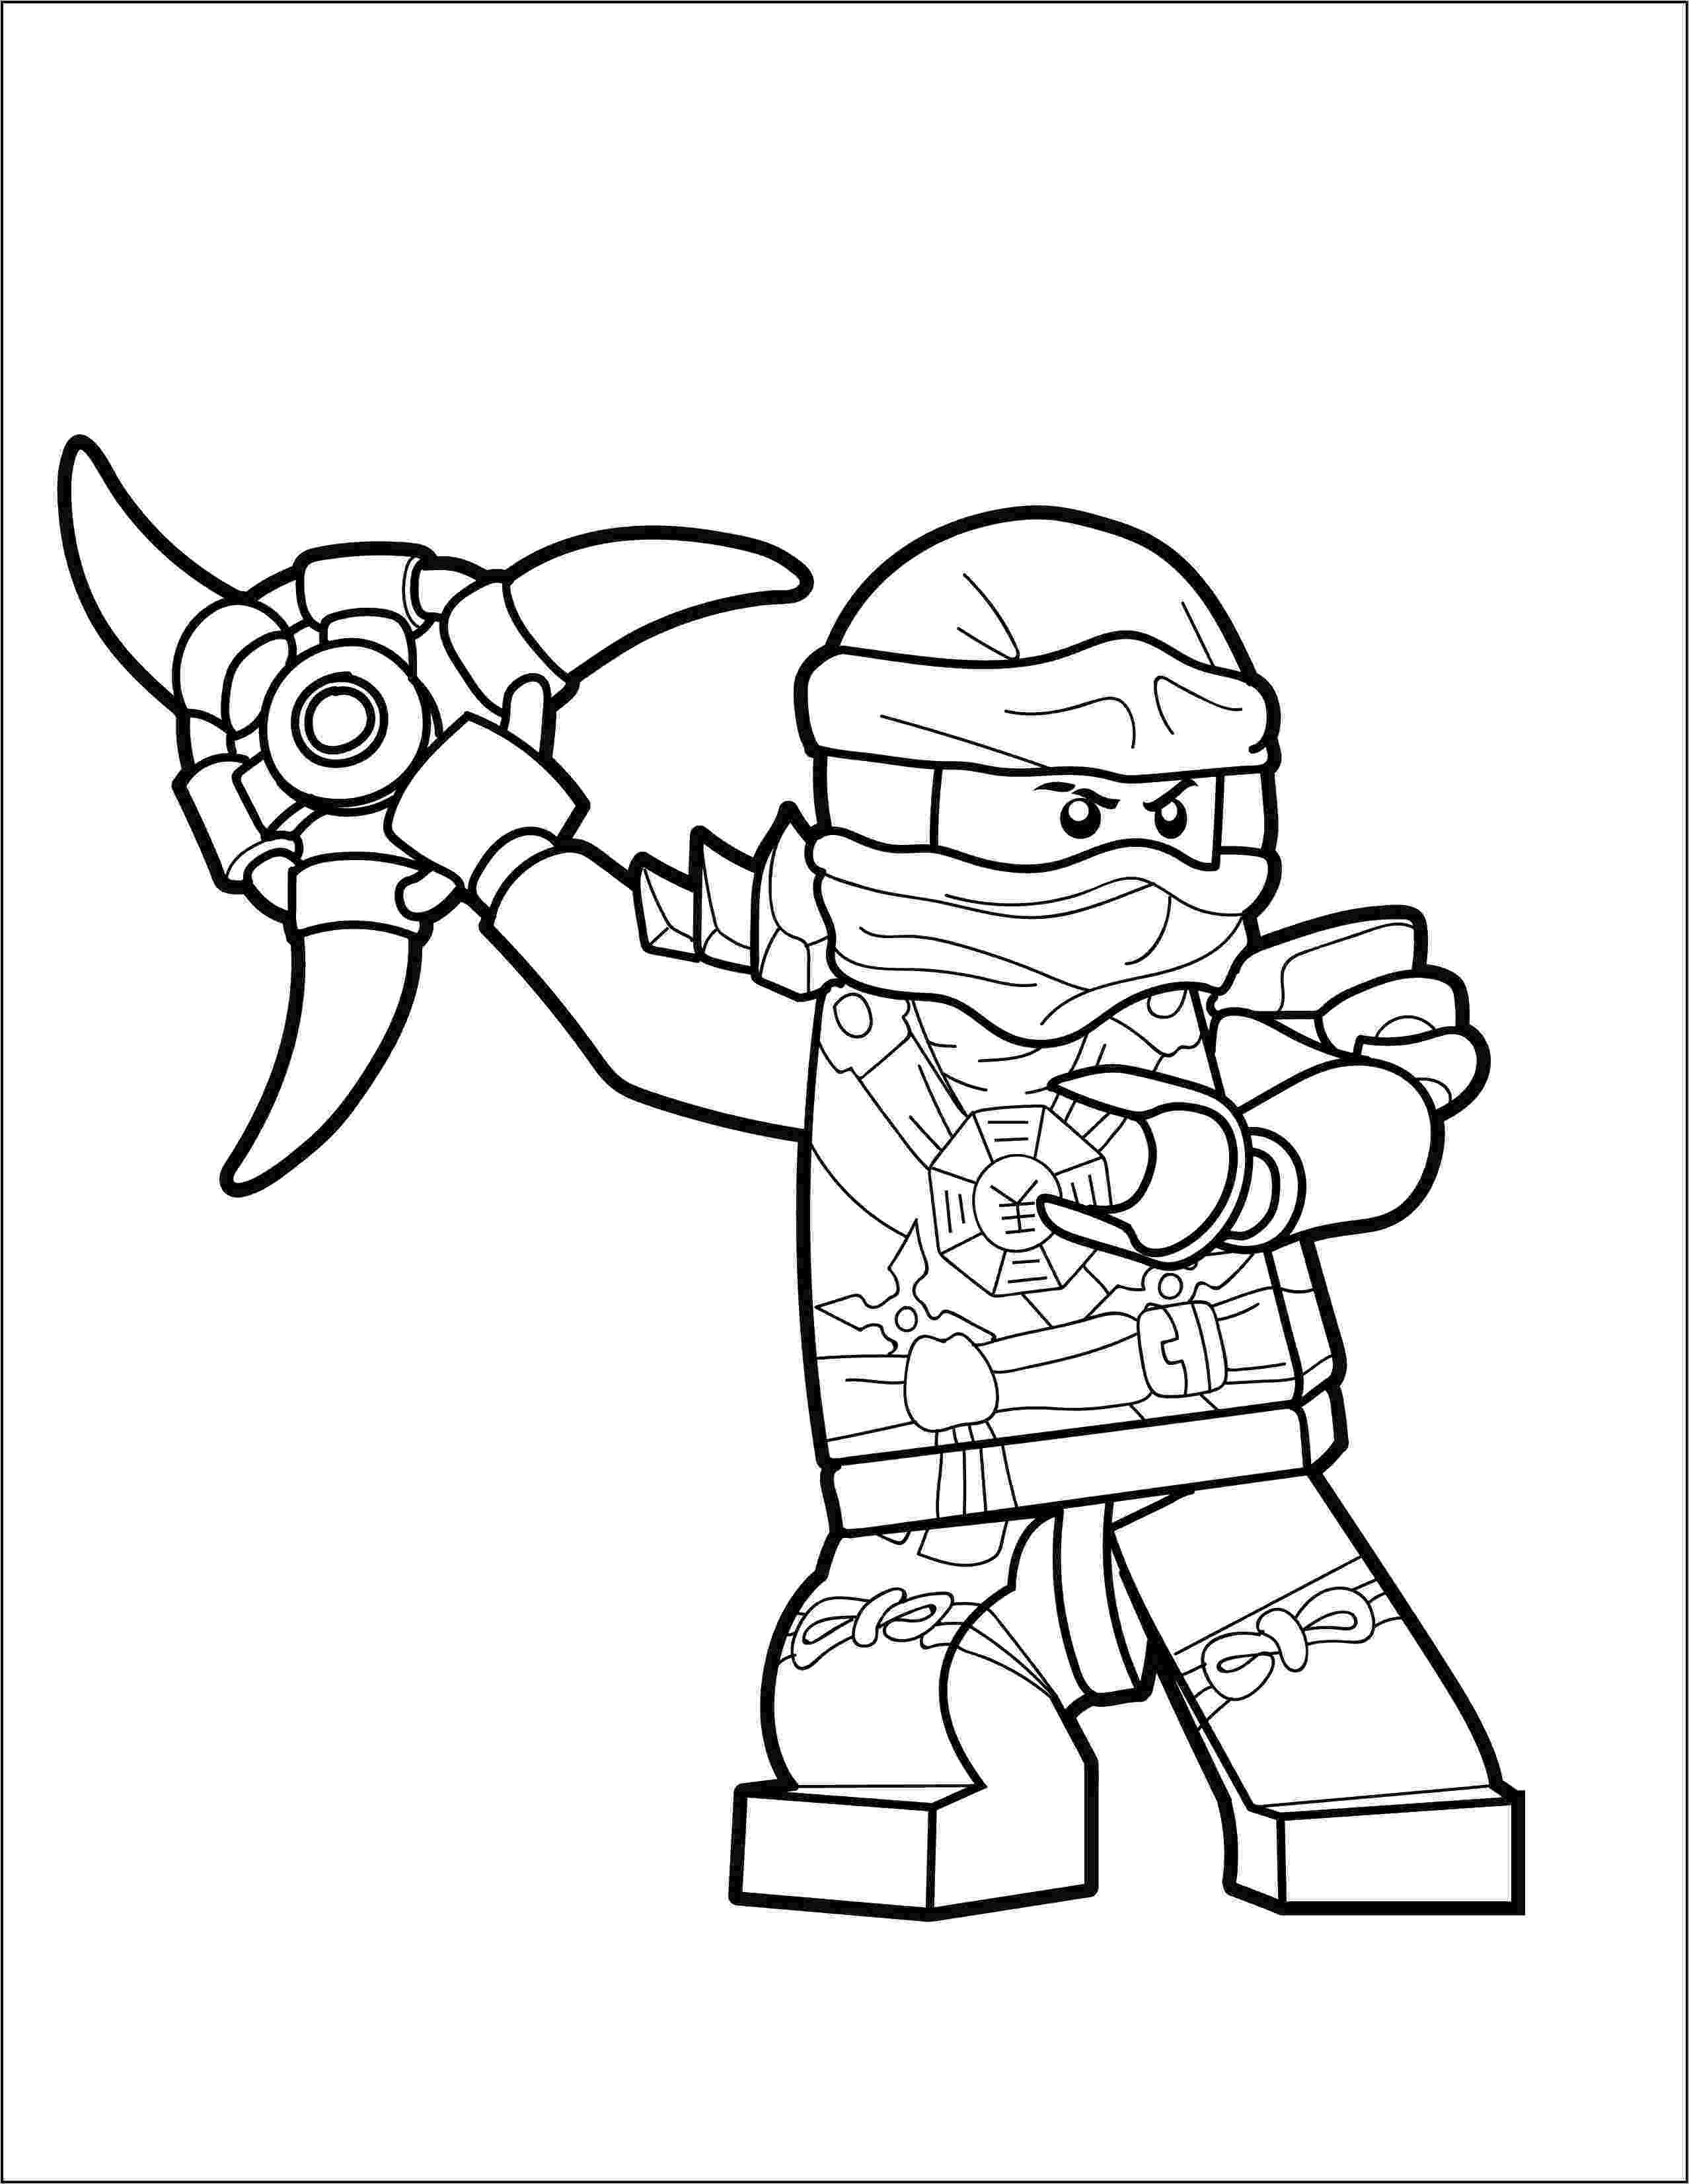 lego ninjago coloring sheets lego ninjago kai coloring pages team colors coloring lego sheets ninjago